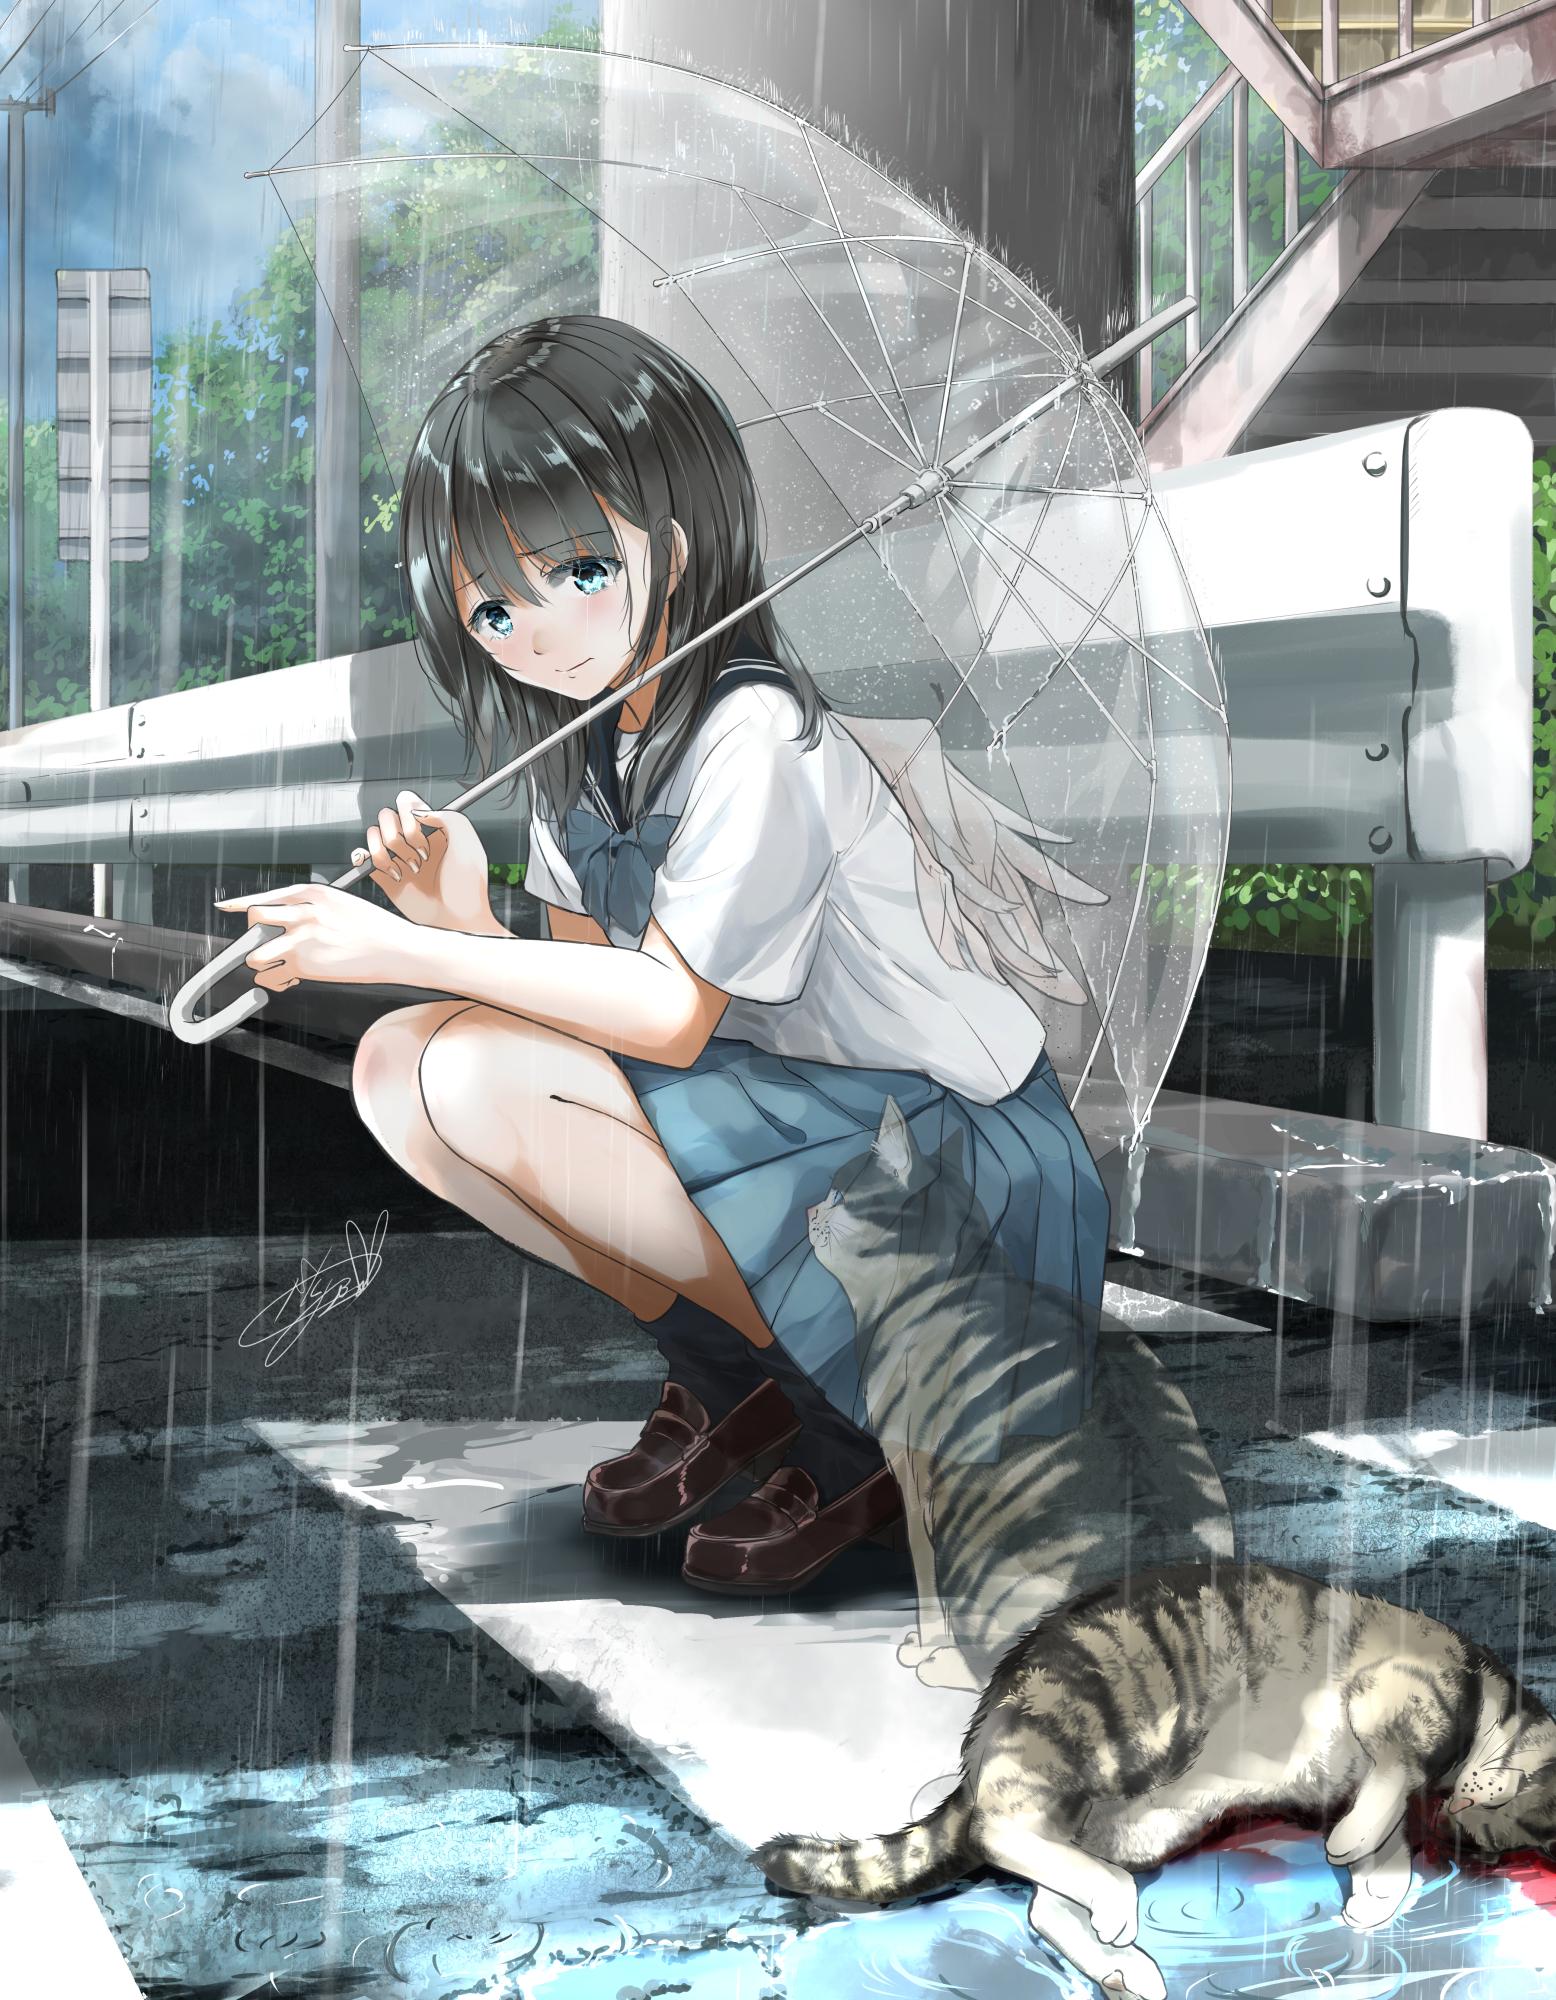 Anime 1556x2000 sad cats angel ghost melancholic wings death rain umbrella school uniform squatting anime girls Soragane artwork